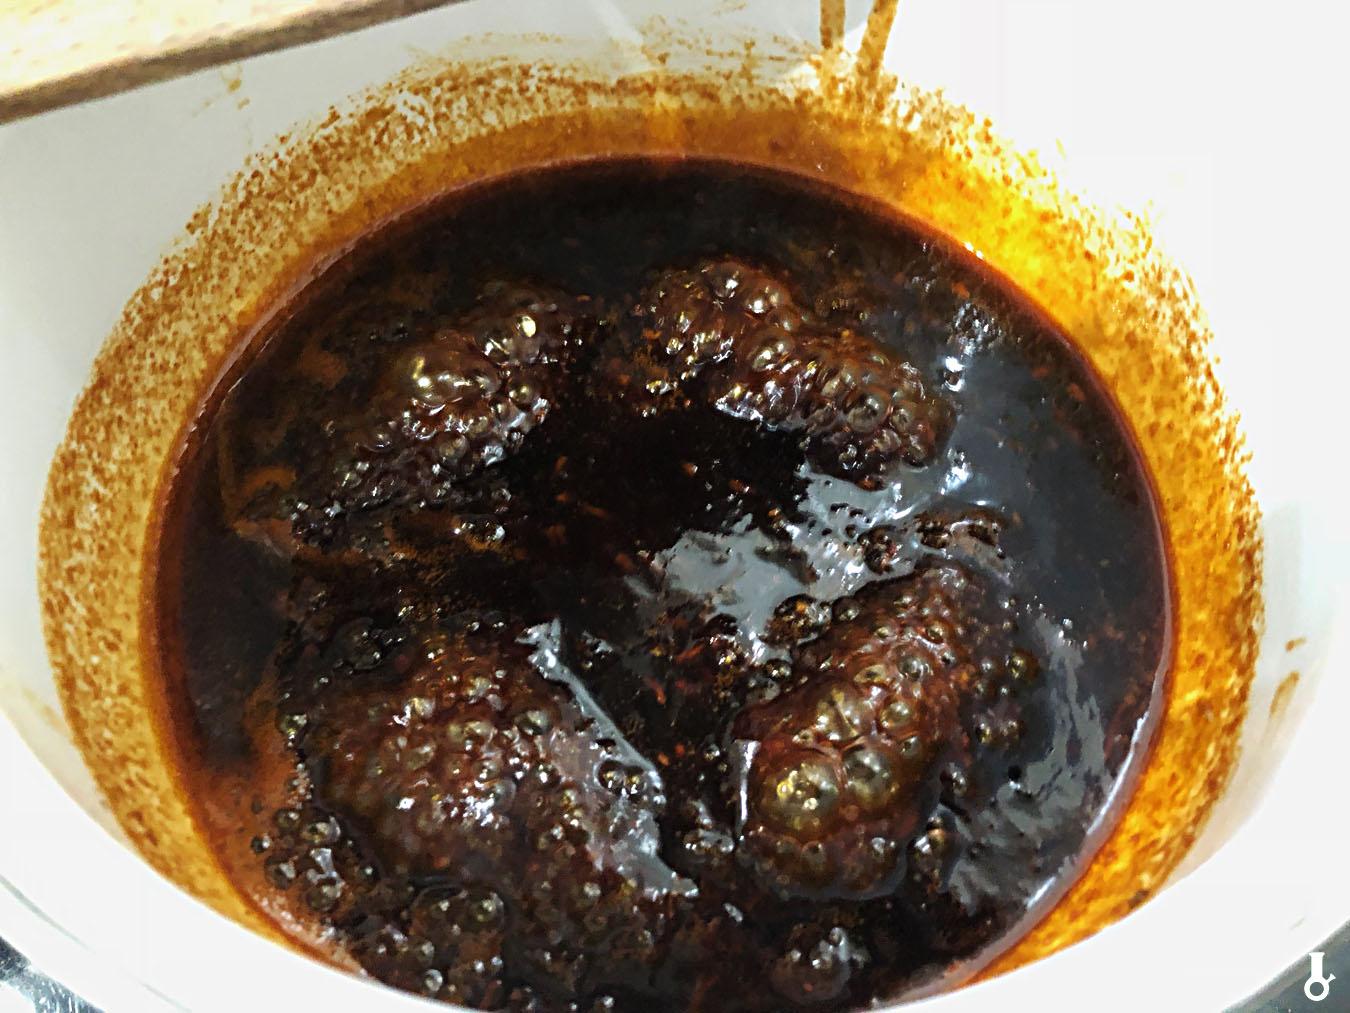 zagotowany sos bulgogi